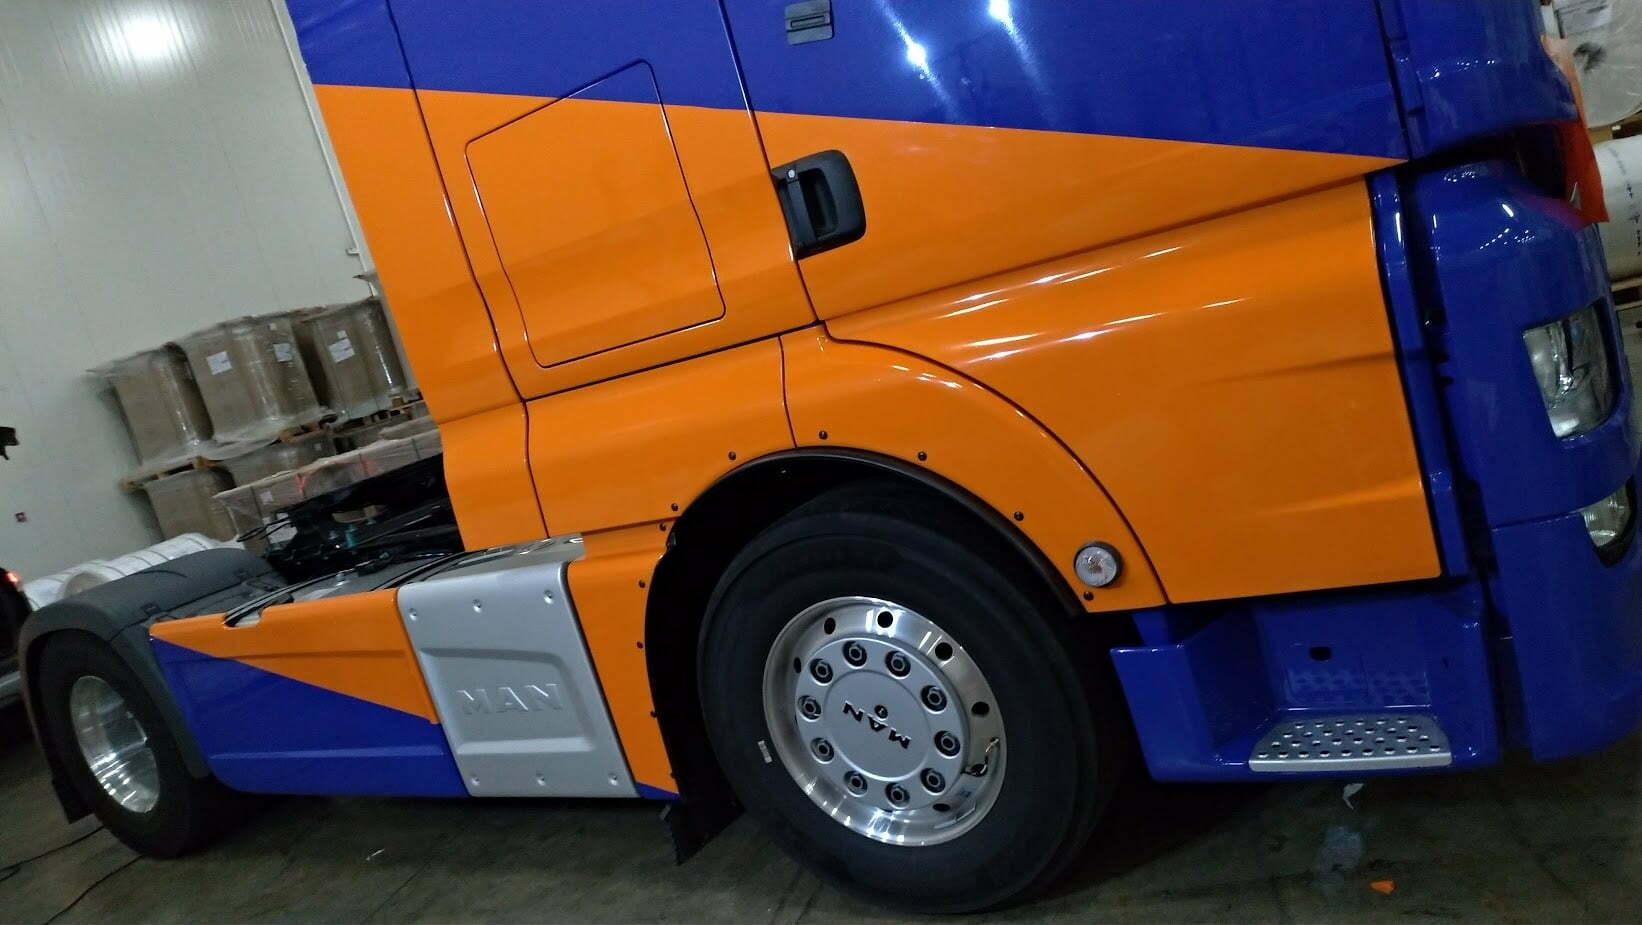 ph-transport-cazaubon-covering-landes-dax-camion-capbreton-mimizan-biscarrosse